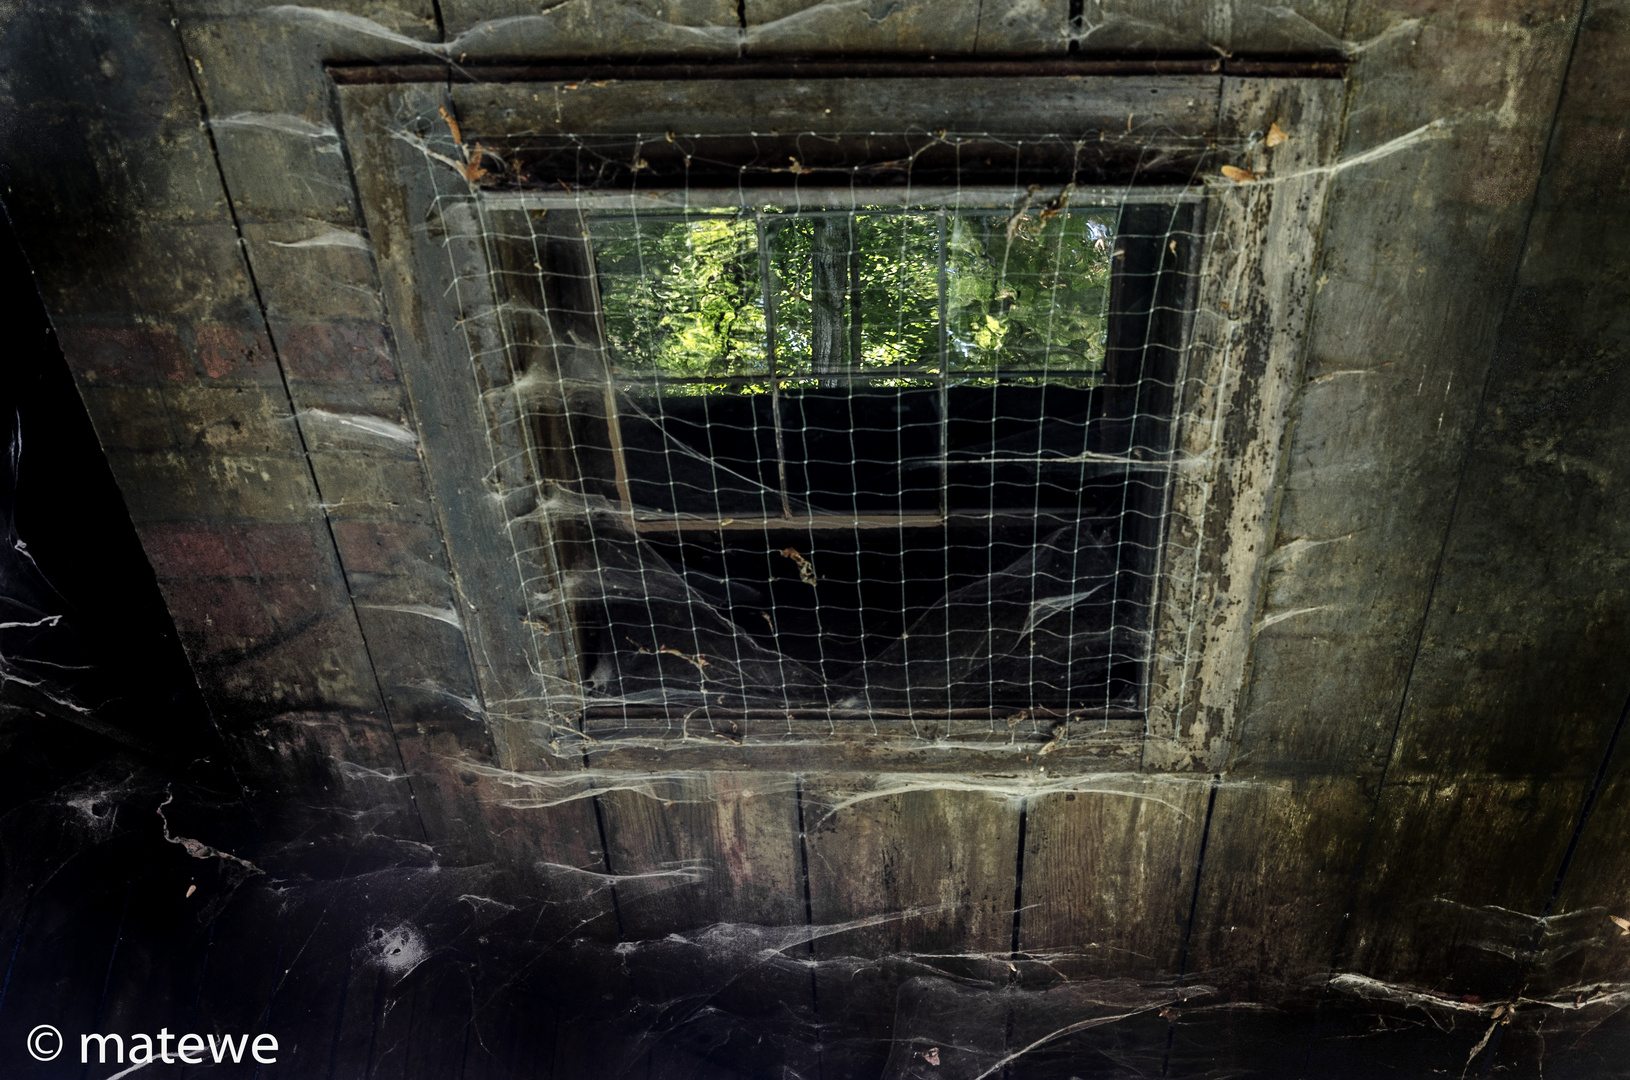 Fenster zum Geisterhaus